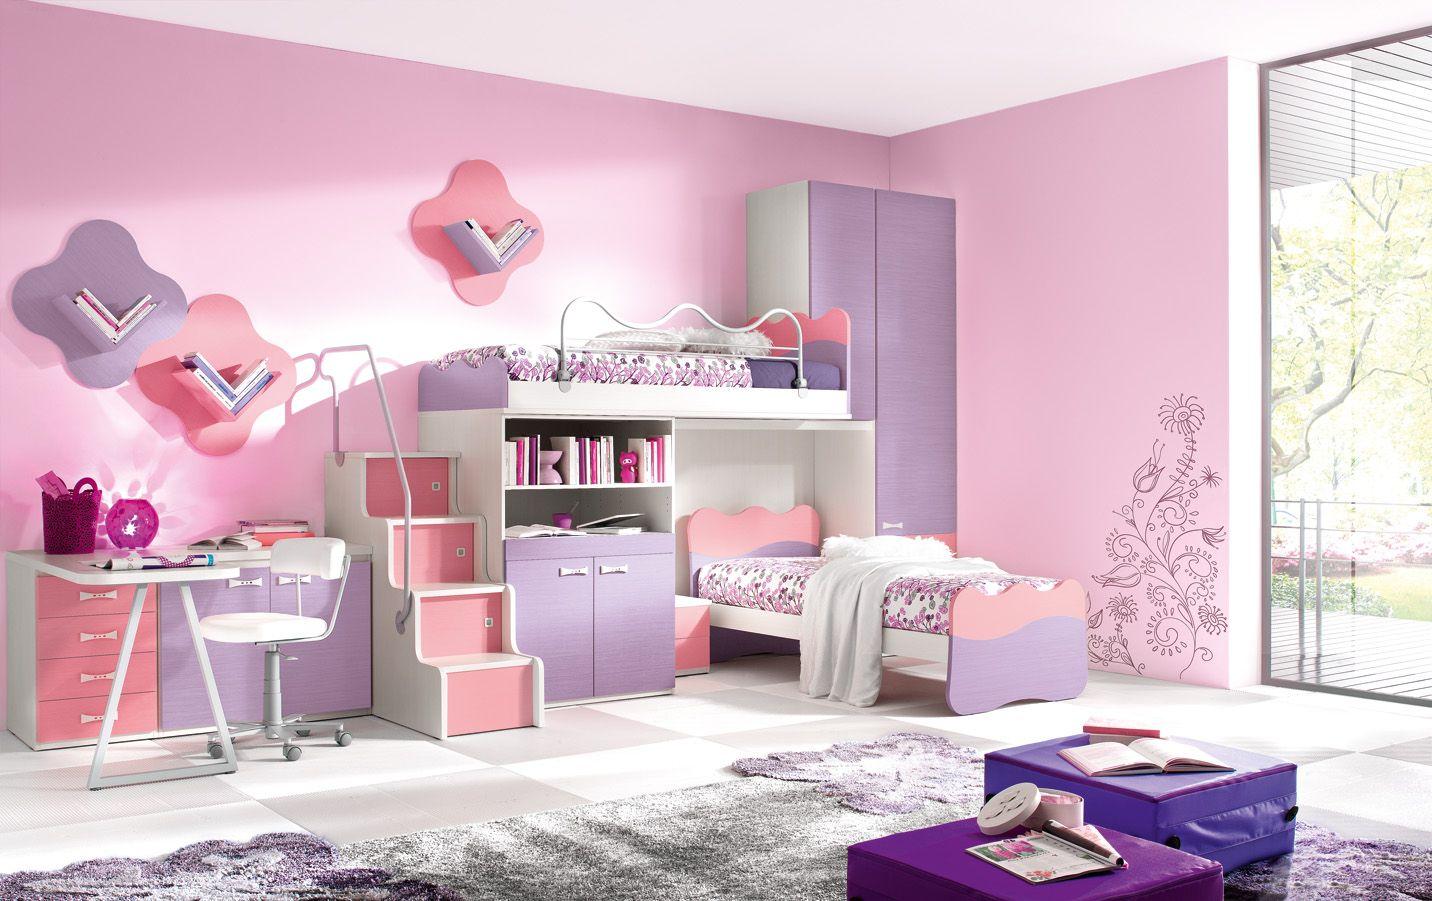 Kids Bedroom Pink bedroom-extraordinary-pink-colored-bedroom-inspiration-two-story